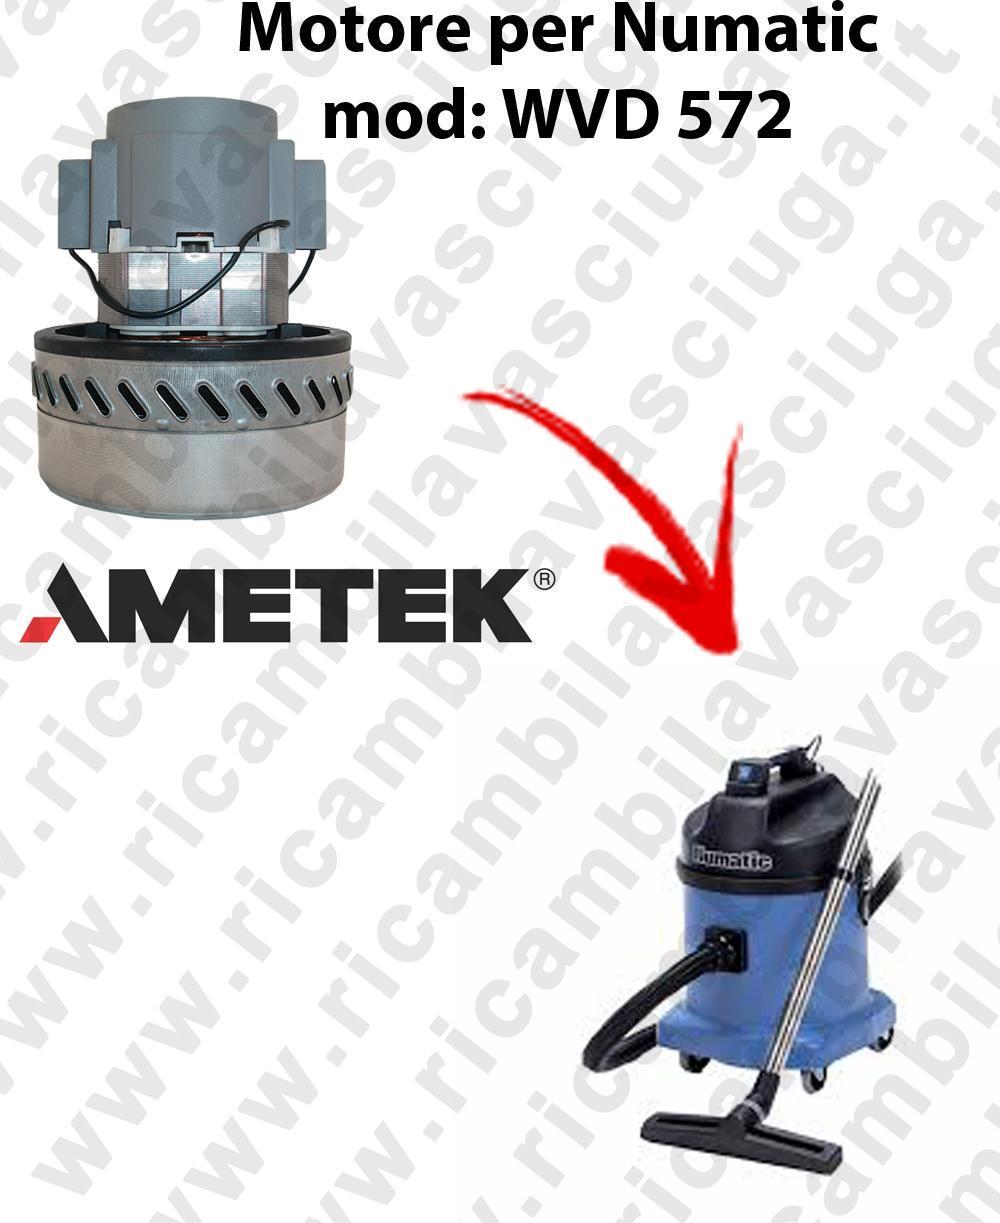 WVD 572  Motore de aspiración AMETEK para aspiradora NUMATIC